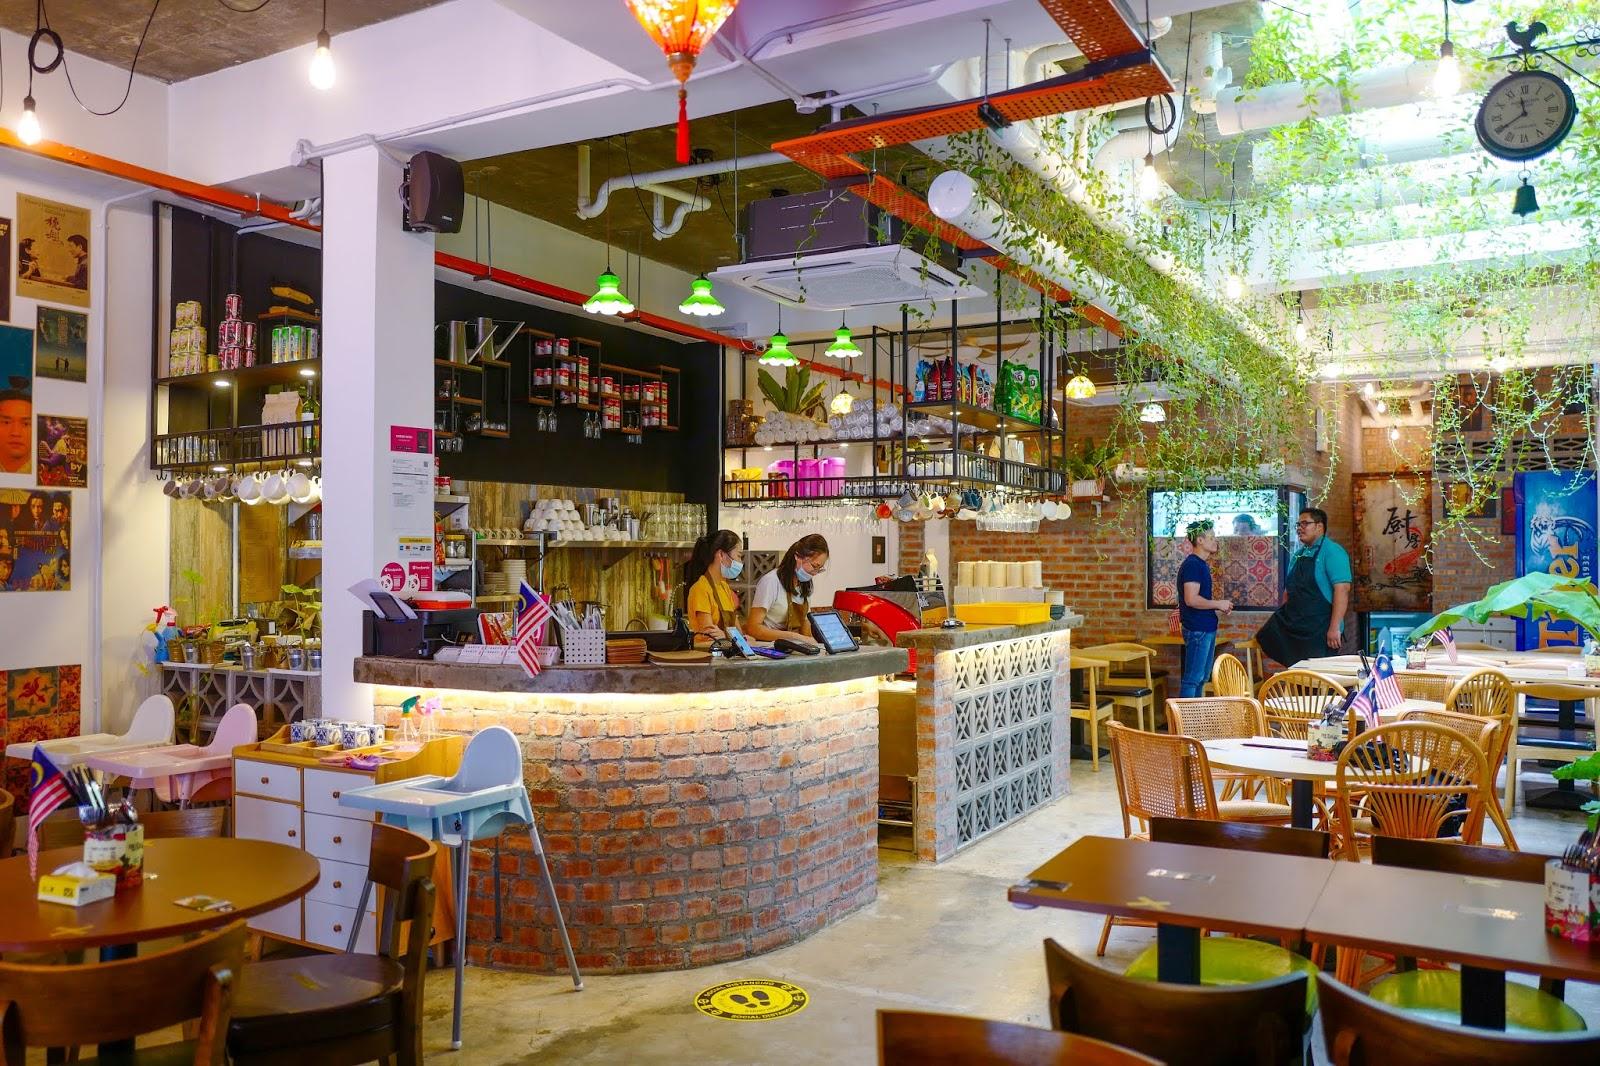 kwong cheung loong kopitiam bar, jalan doraisamy